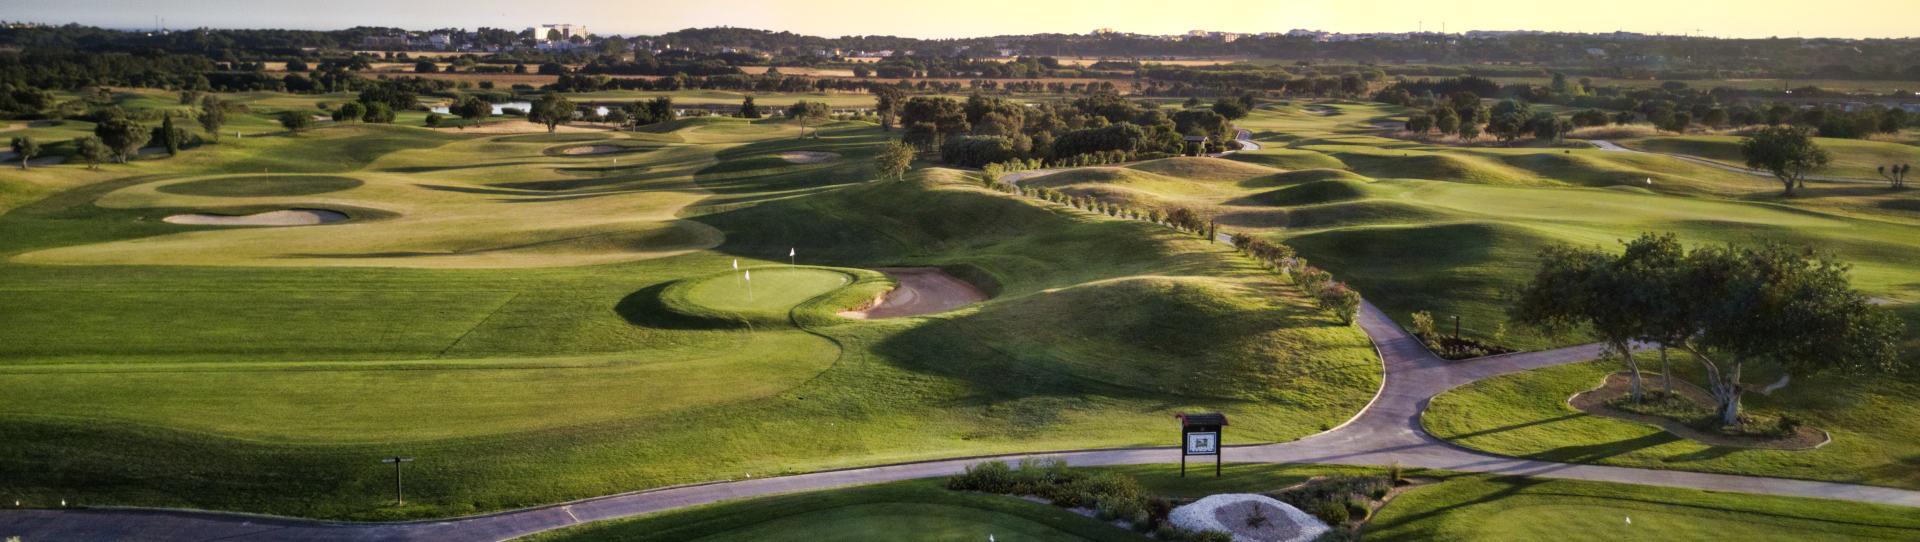 Vilamoura Victoria Golf Course - Green Fee Rates, twilight